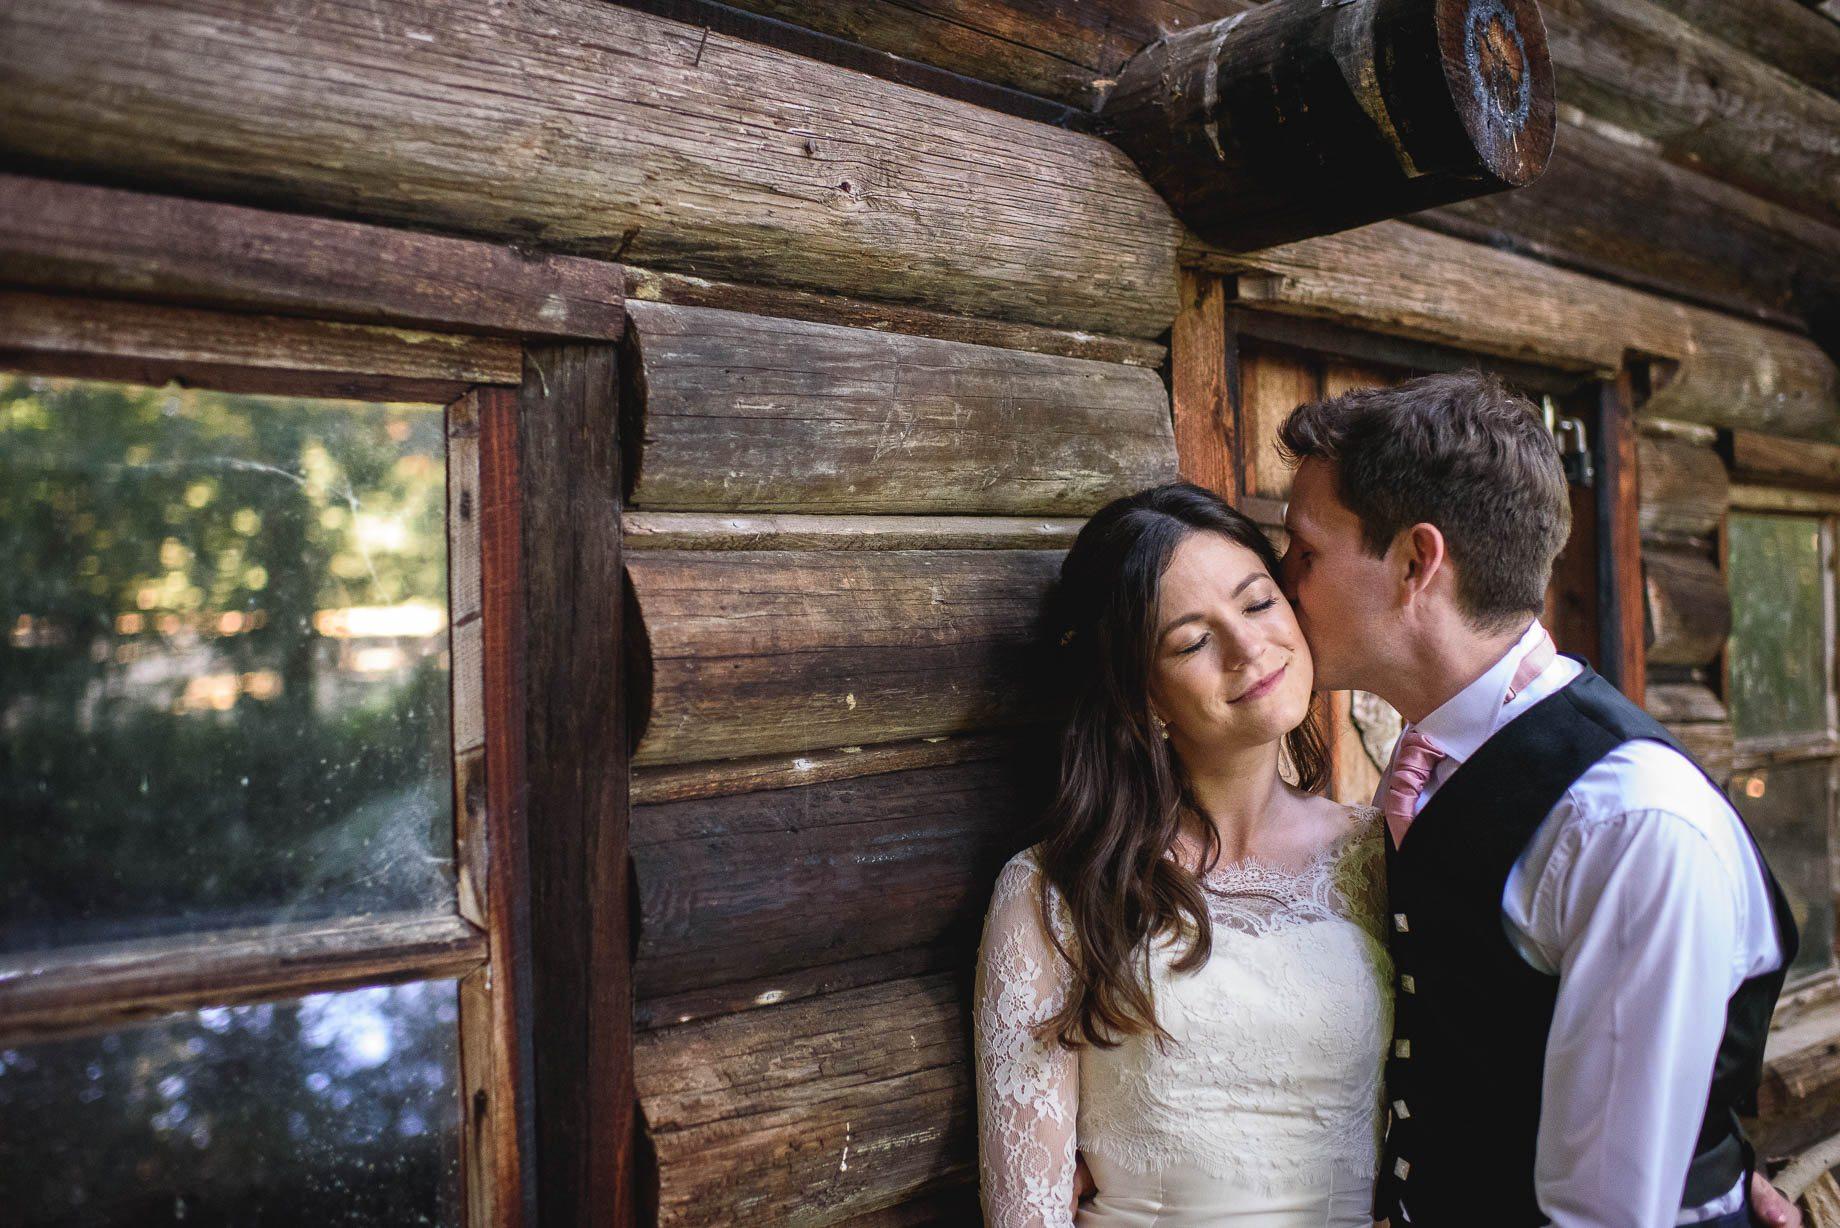 Gildings Barn wedding photography - Sarah and Steve (158 of 190)